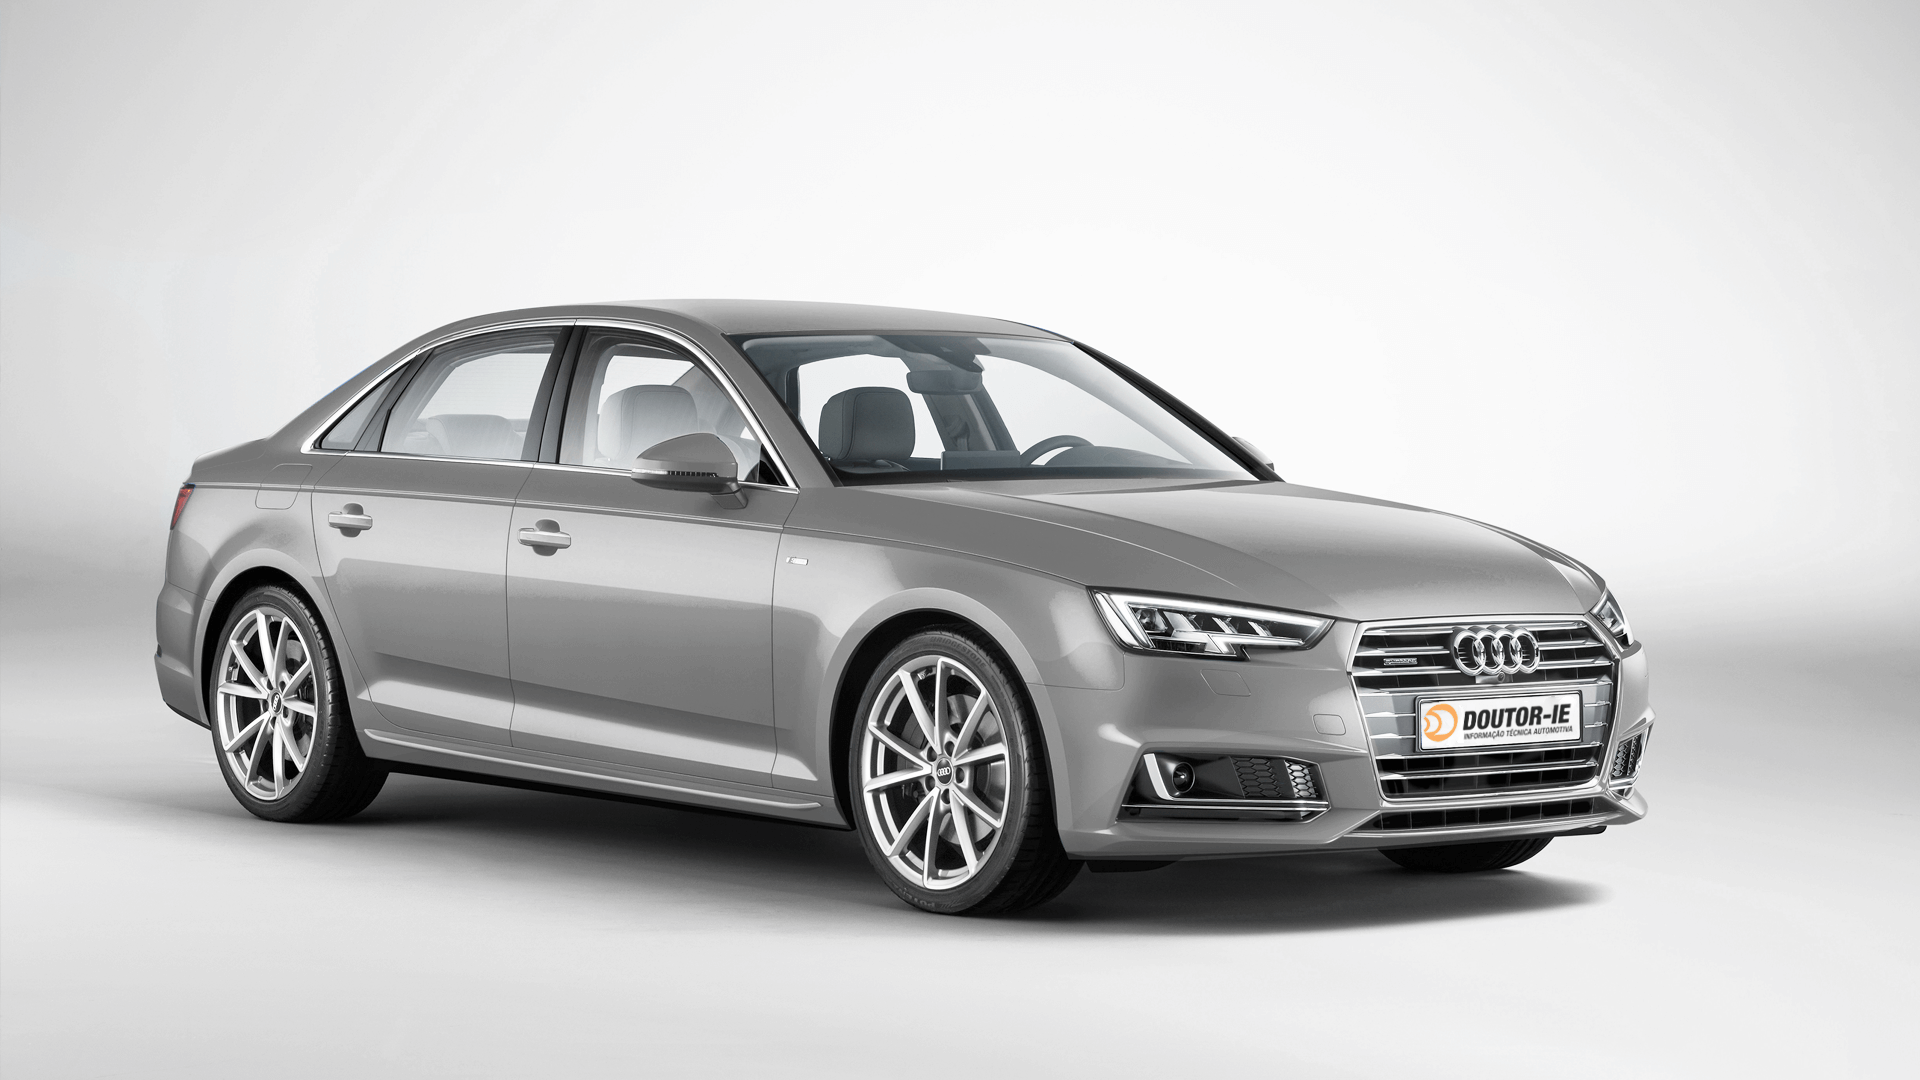 Audi A4 2.0 16V Turbo FSI 180cv (imagem ilustrativa).